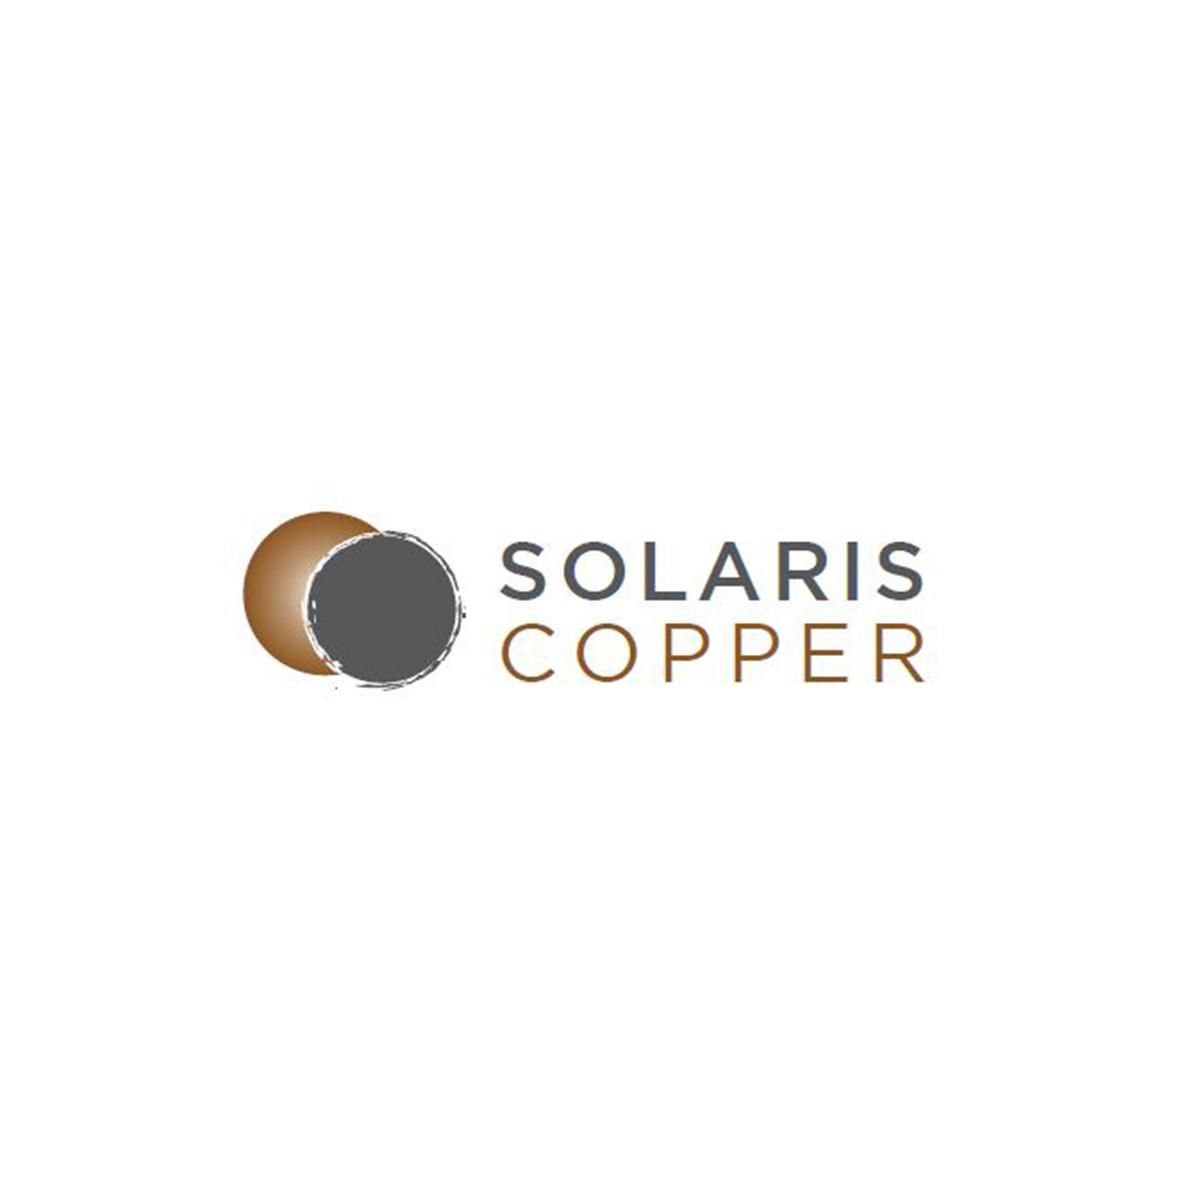 Solaris Copper Closes C$3.9 Million Private Placement